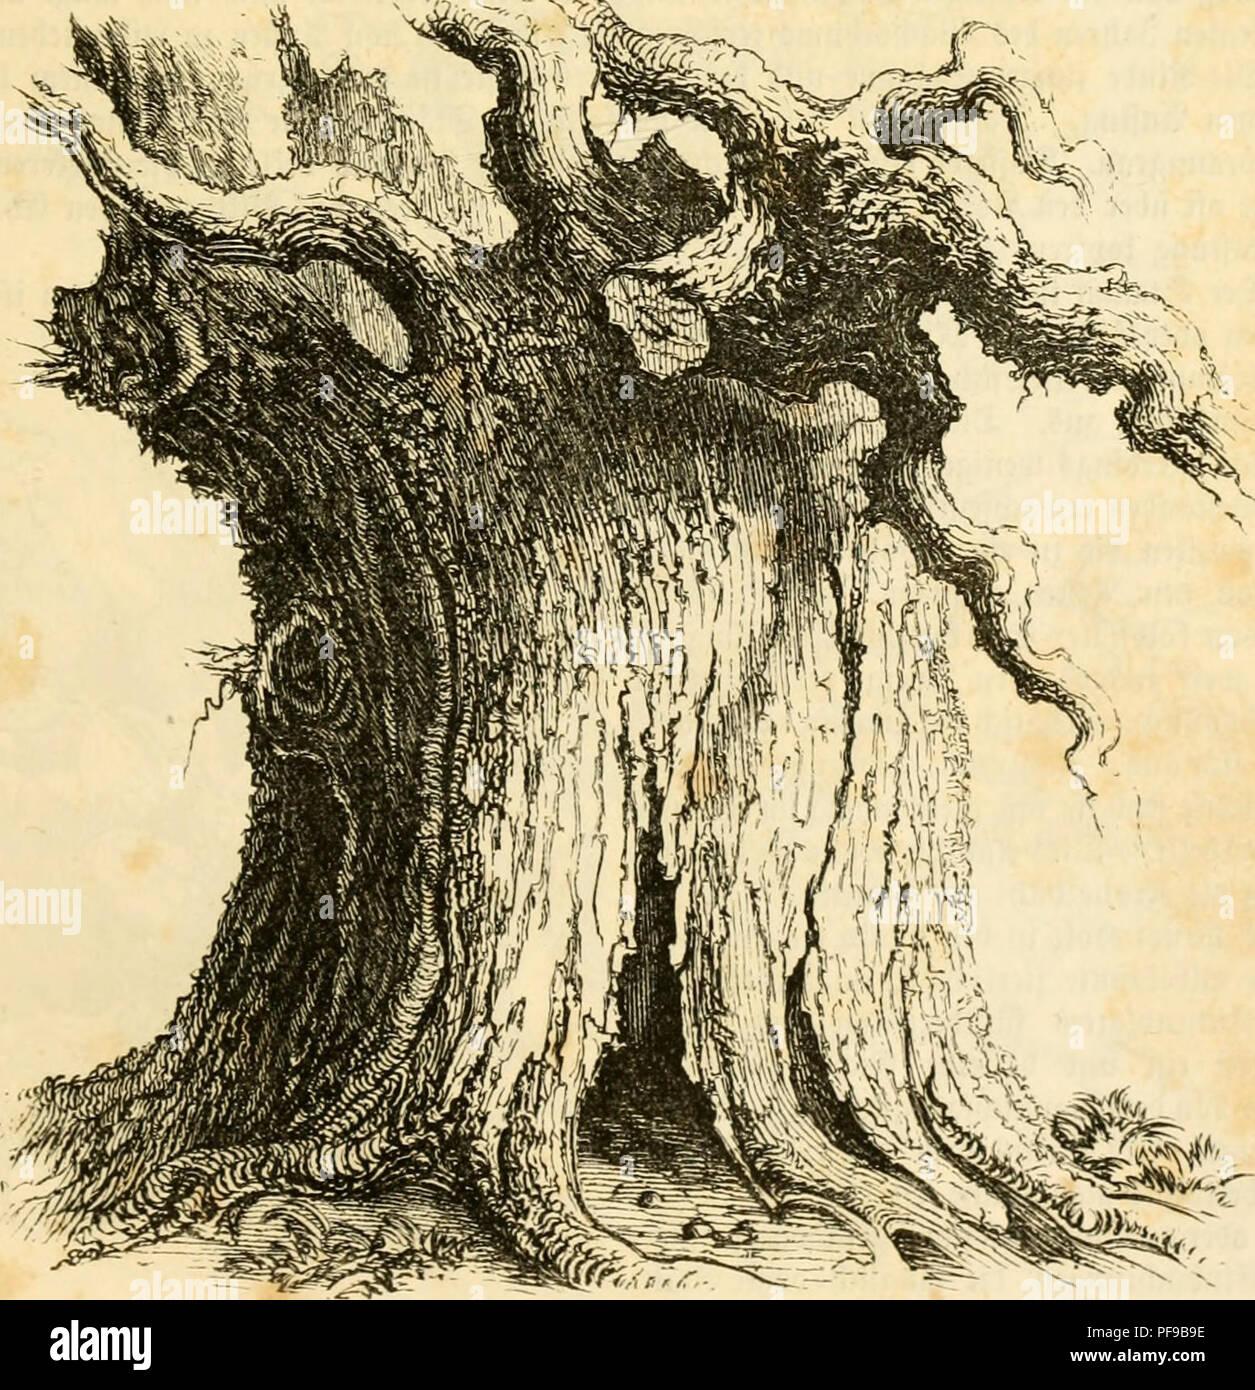 ". Deutsche Waldbäume und ihre Physiognomie. Trees. 21 iscvinai' i(no xiqm', fraftii^^ ÄoiiftitutuMi, ^urdl '^lltcv imt» 3oit »v'^HMu^t, nidn axid) tie fitcifcntc .*cbotis?fiift n fcffdn, Dami tväilt- nnc bei fräftuicn 'Wciifclu-n, Tai? 'Oaiivt ^iicrft tiVo ,V""iclH""ii reo WrctKiialtcrci. VHllmäMifb bleibt tiVo fonft jäbvlicb ^uri'irftebrcnto Vaub an ton cbcvcn iinf äufjcvftcii'Jtcftcn auc>, nnt crft nacb mit luid' ftn'bcn Mo imun-on cMni OUictcv ab. Sod^ norti fdbft tcö ^^*aubfdnmirfo beraubt, verleiben Me nacften ^Hefte tem fräftiyV'"" '-Baume einen vittoreöfen C^ffeft. 3n - Stock Image"